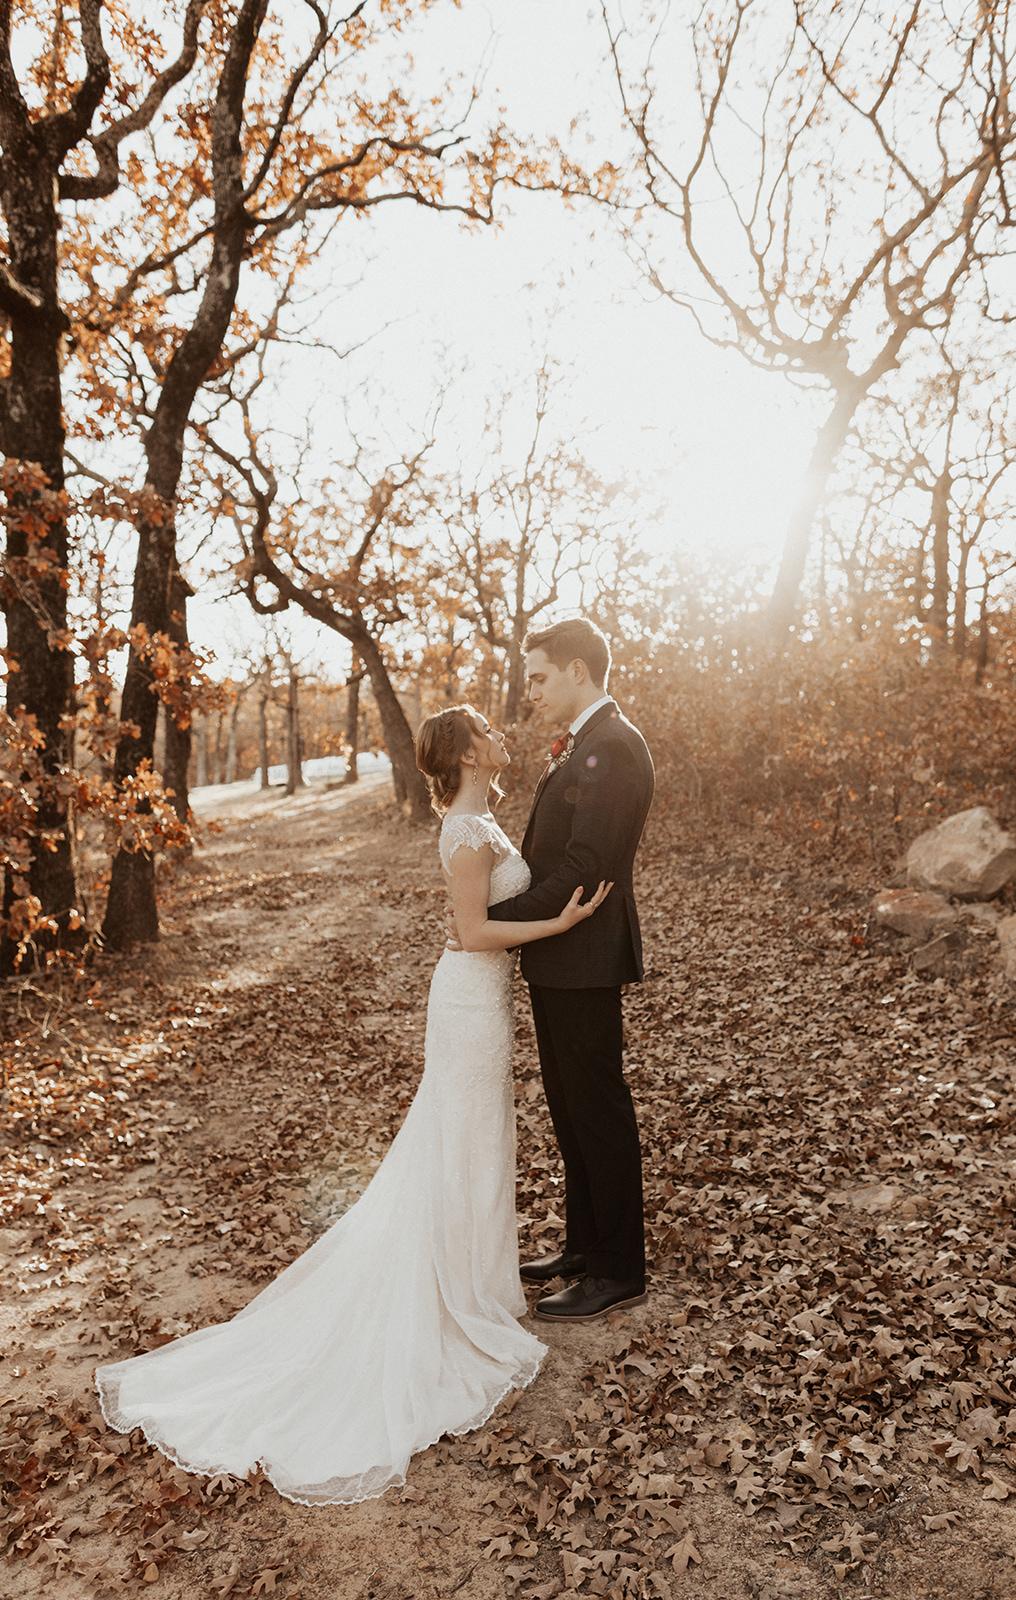 Best Wedding Venue in Tulsa Bixby Dream Point Ranch 22.jpg